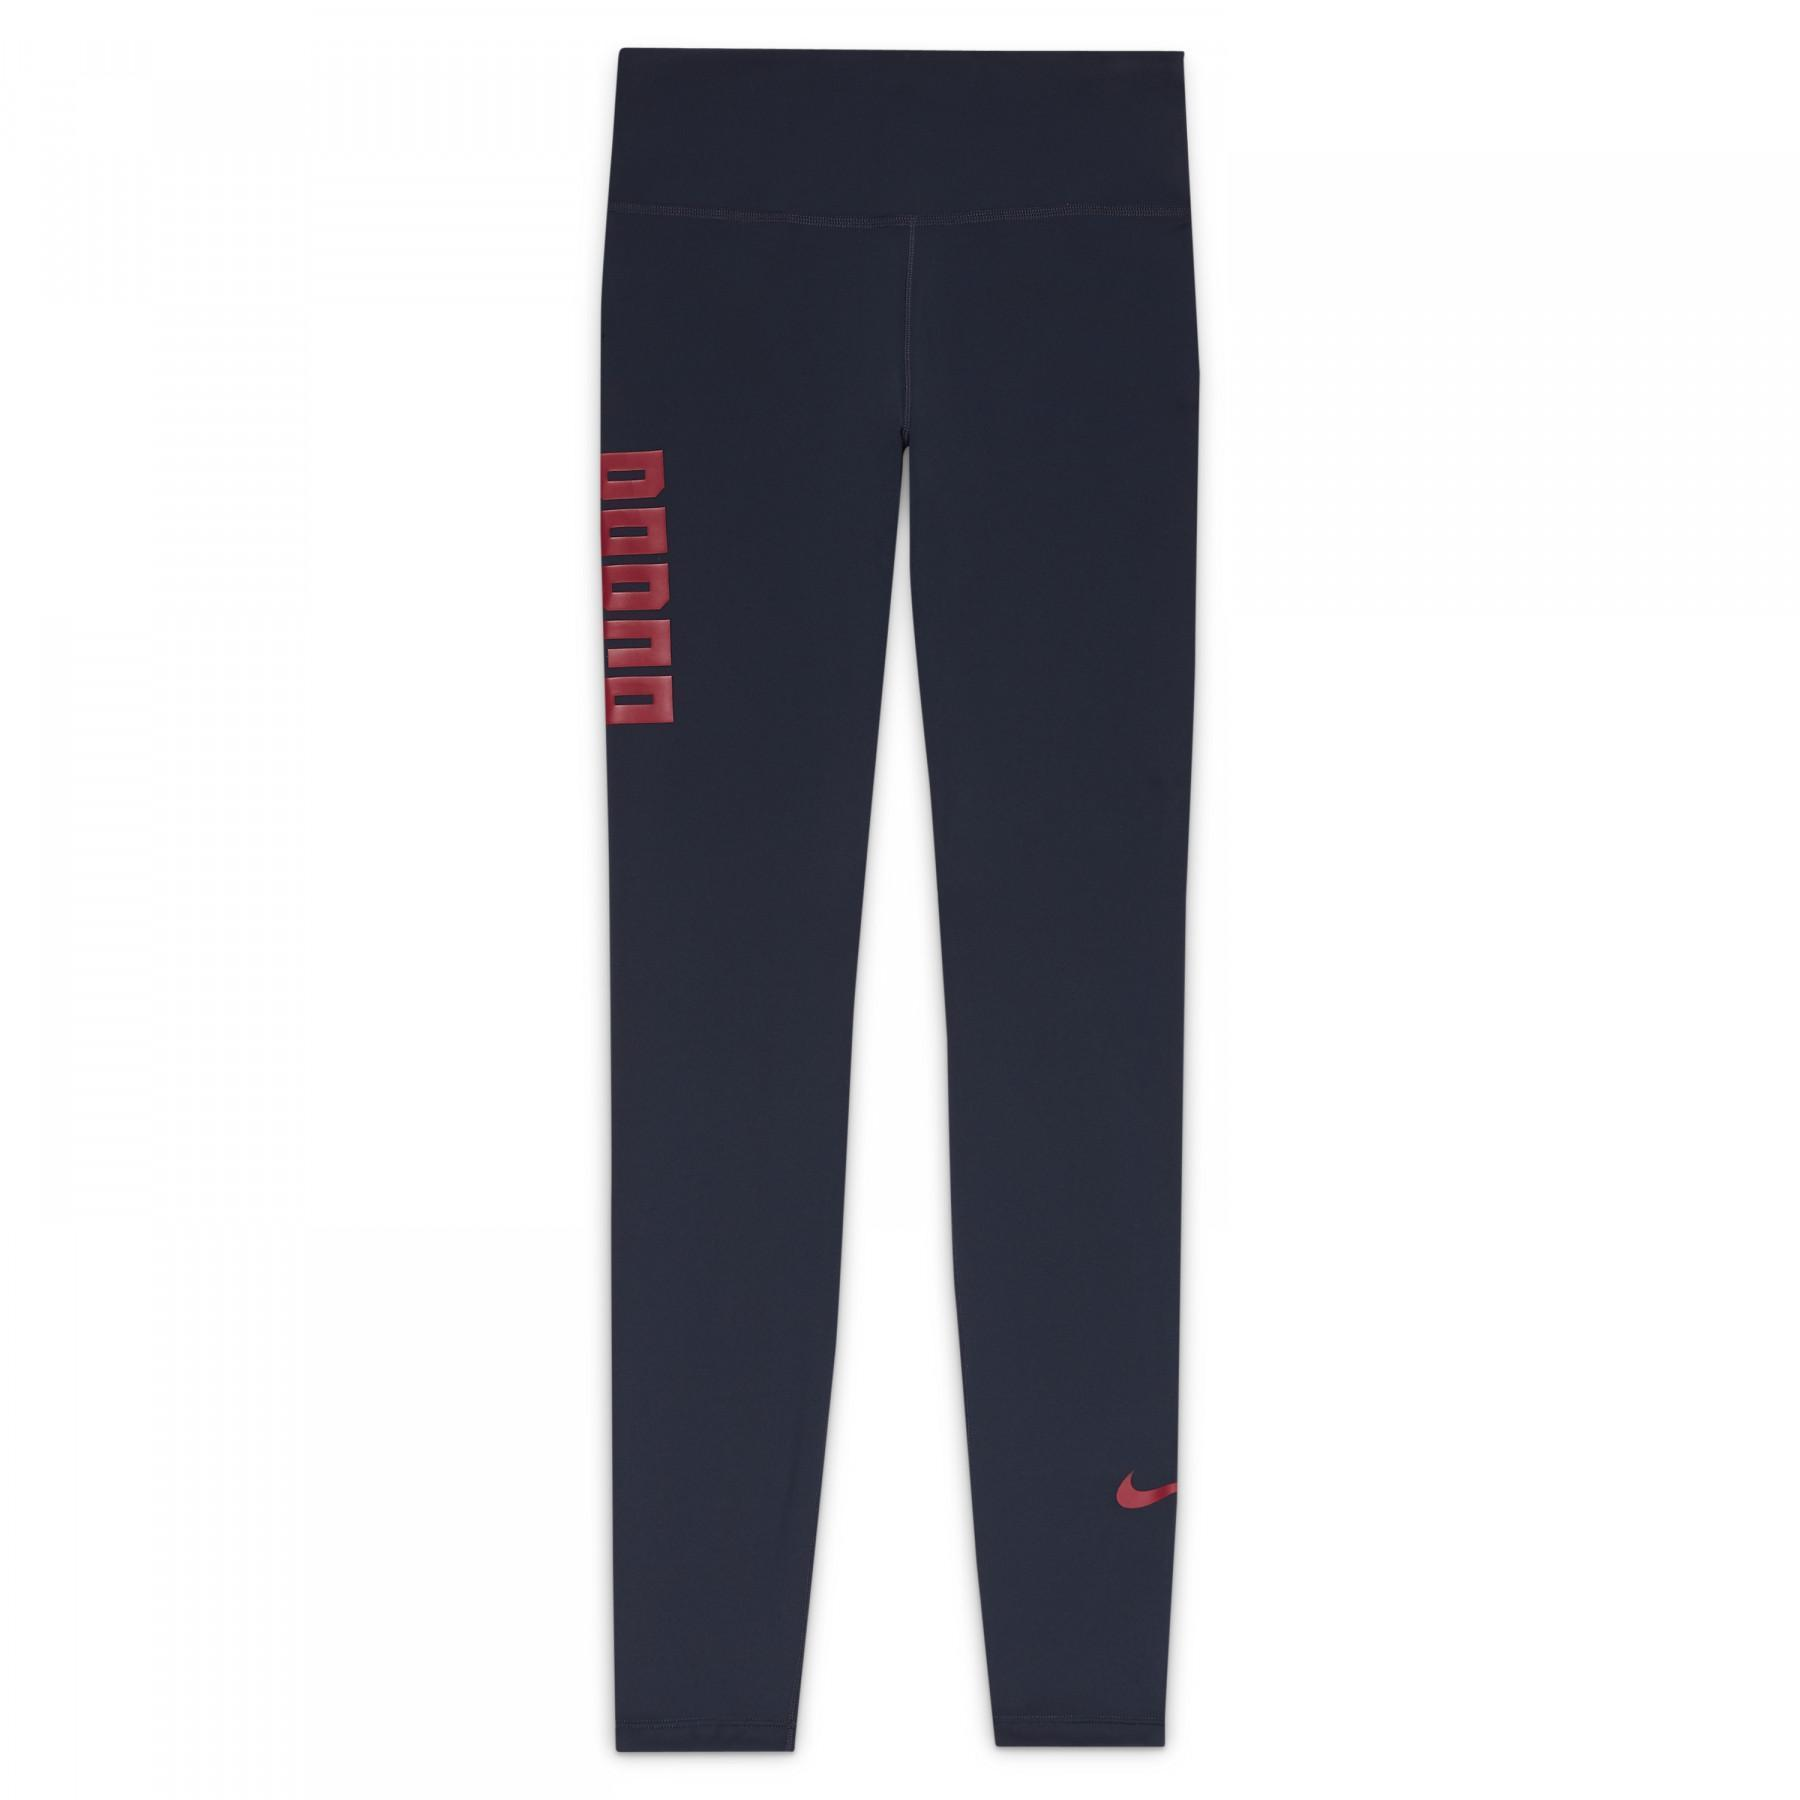 Pantalones Mujer Barcelona Clasico 2020 21